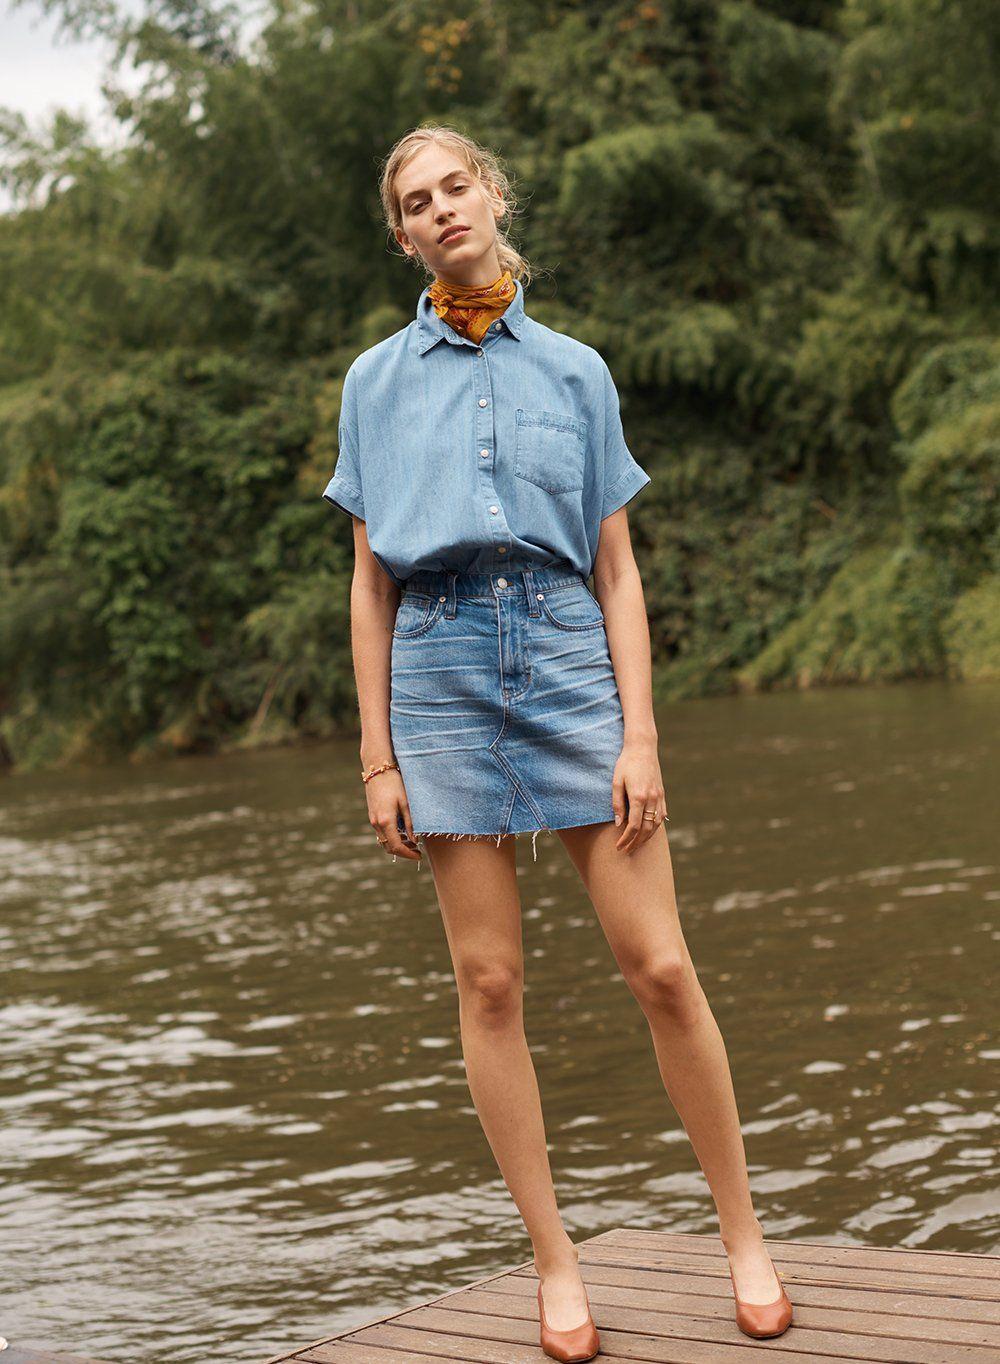 664405a6d3 madewell frisco mini skirt worn with denim short-sleeve tie-front shirt